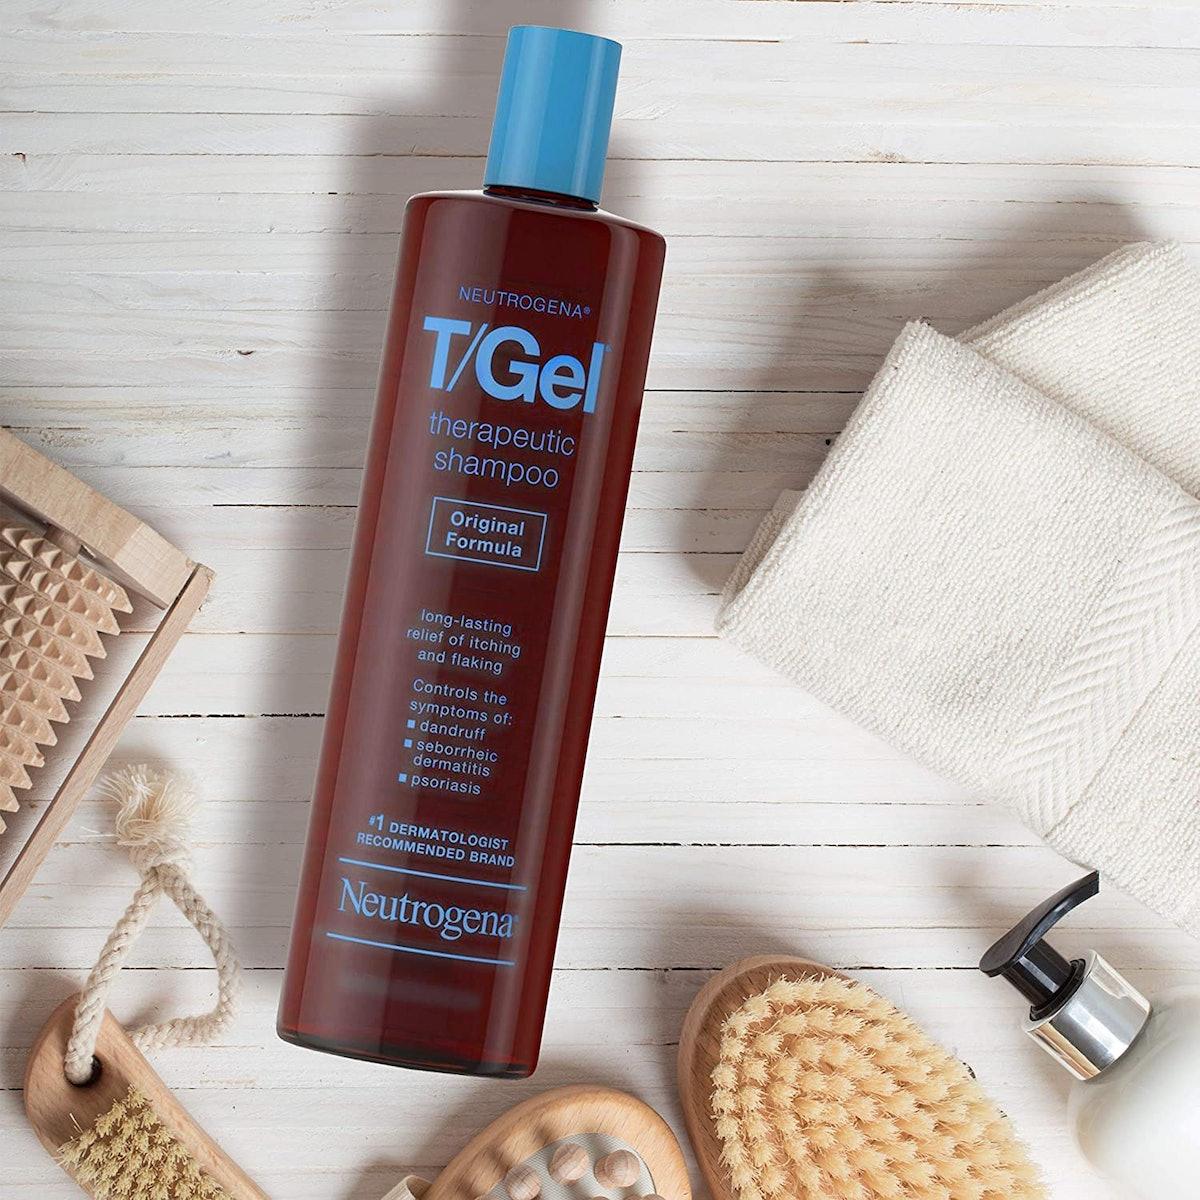 Neutrogena T/Gel Therapeutic Shampoo, 16 Oz.